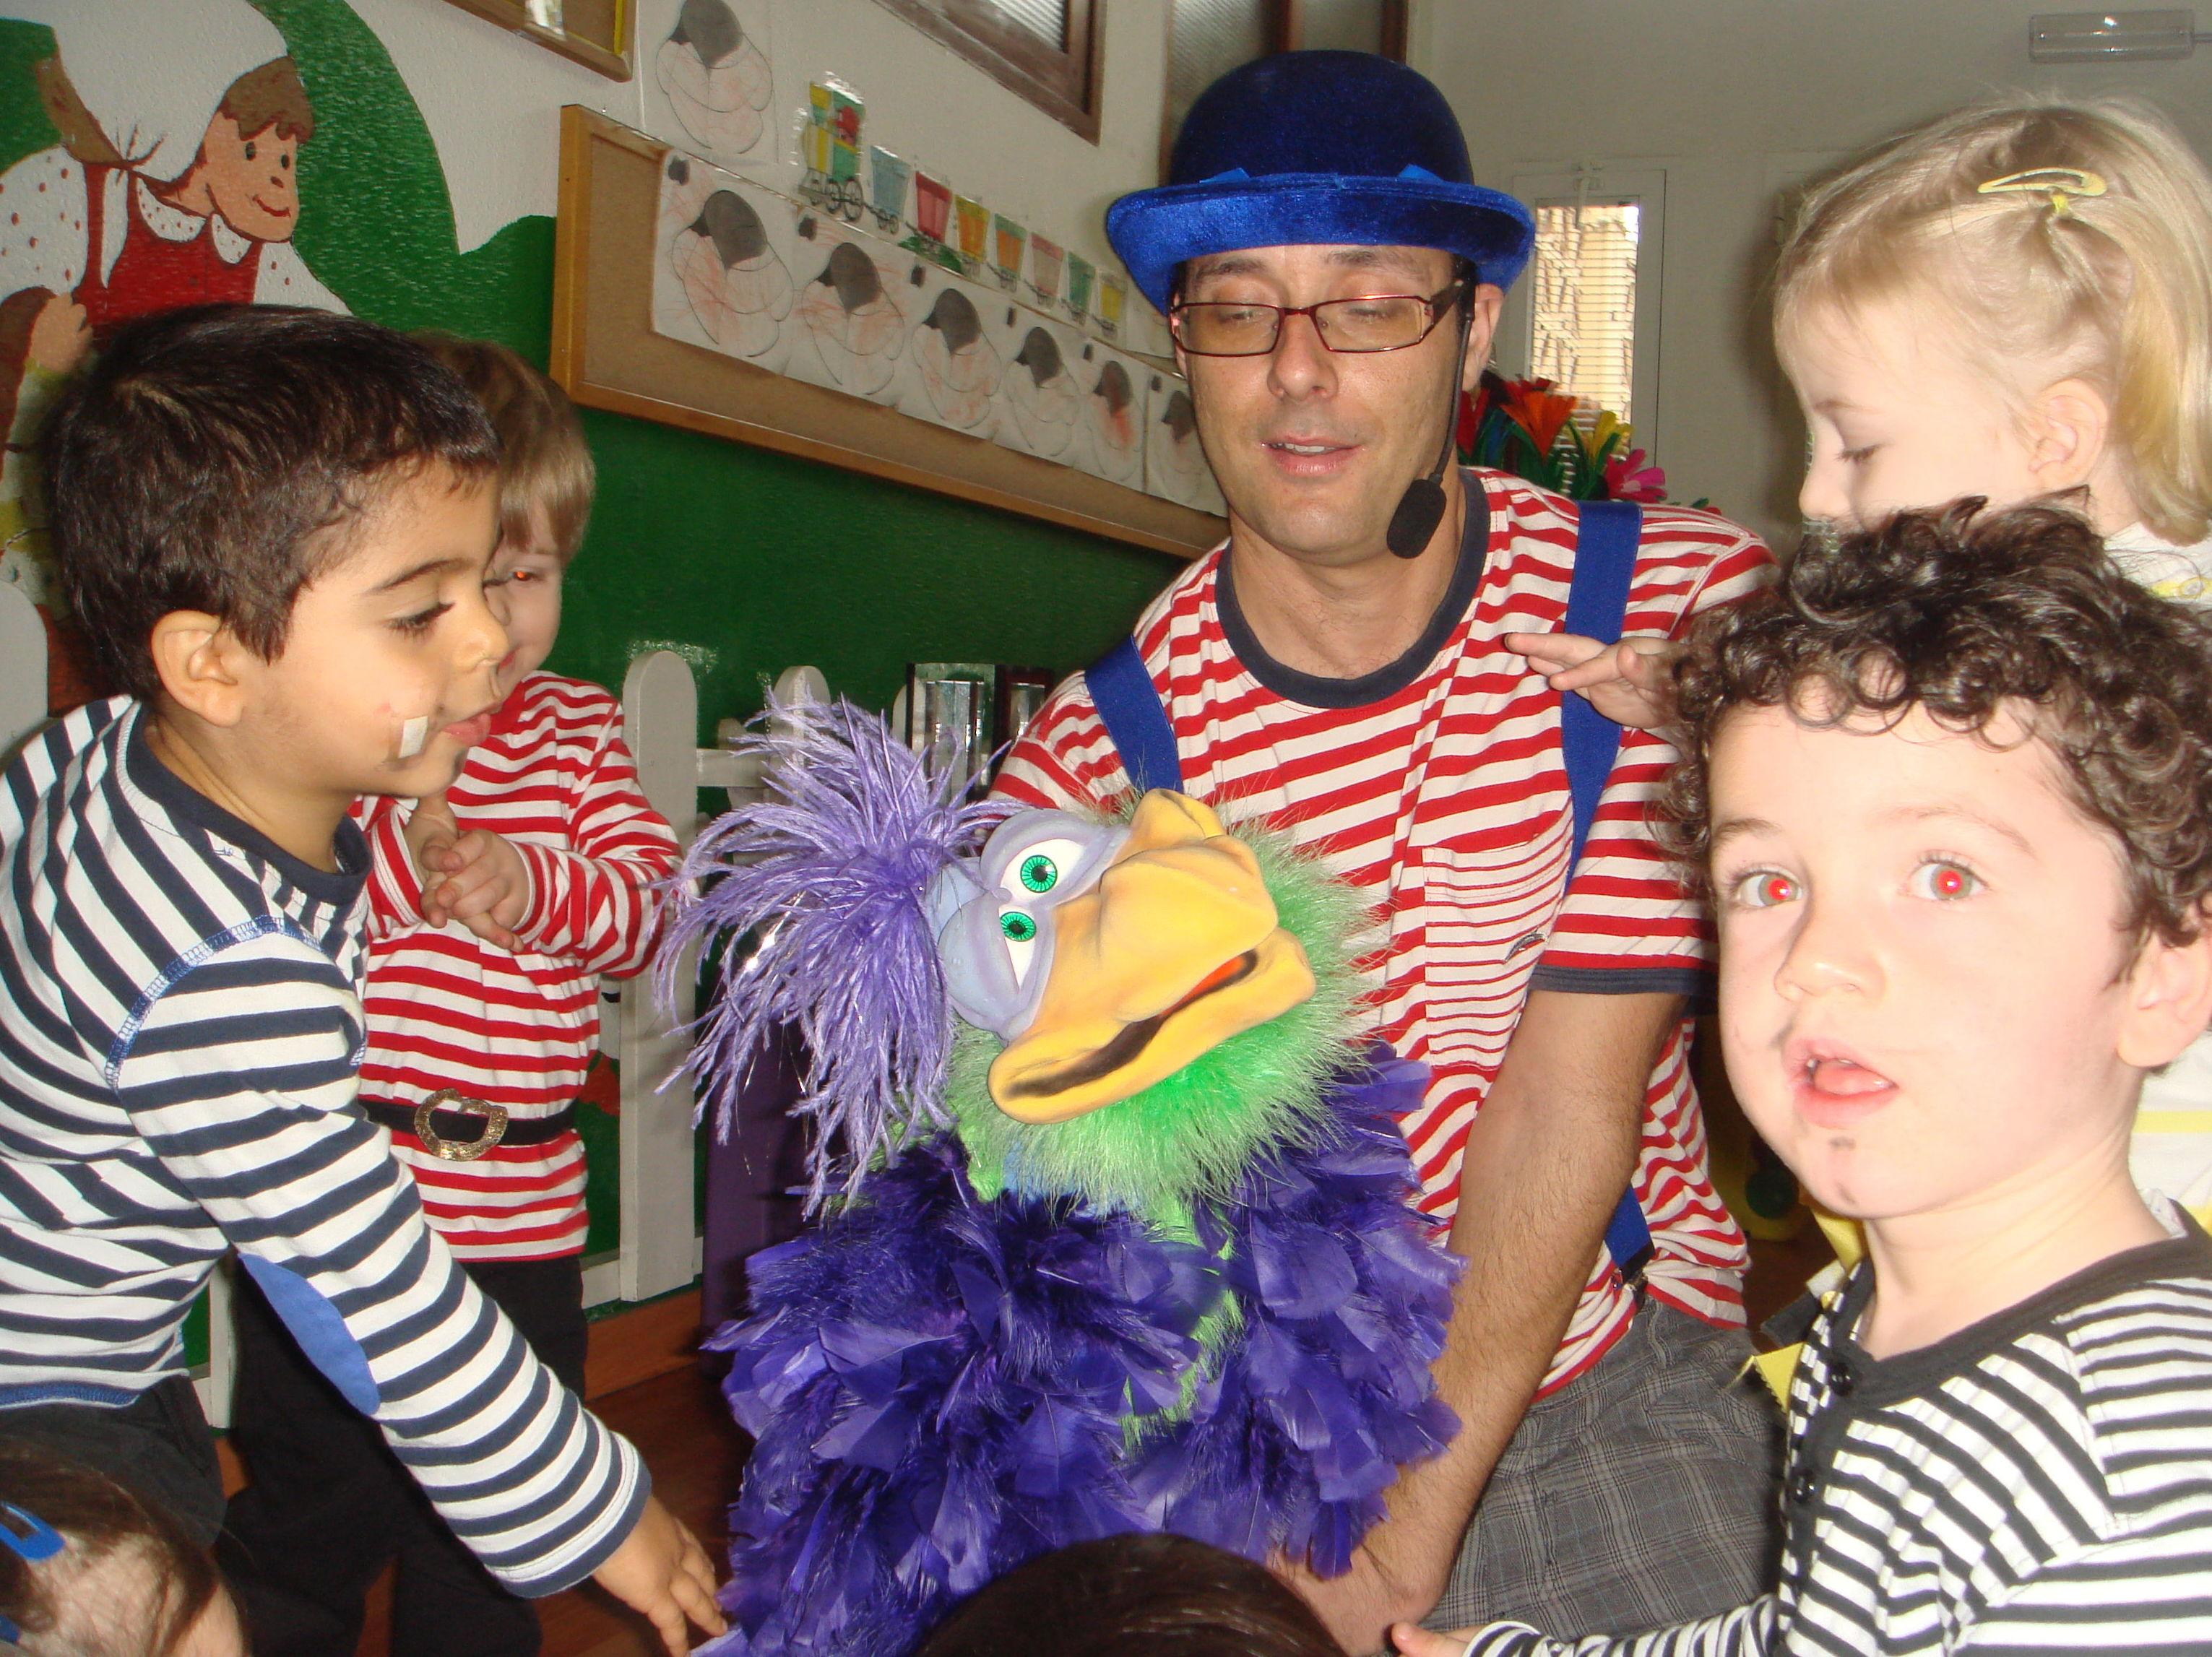 Escuela Maternal Infantil Dr. Sánchez en Las Palmas de Gran Canaria